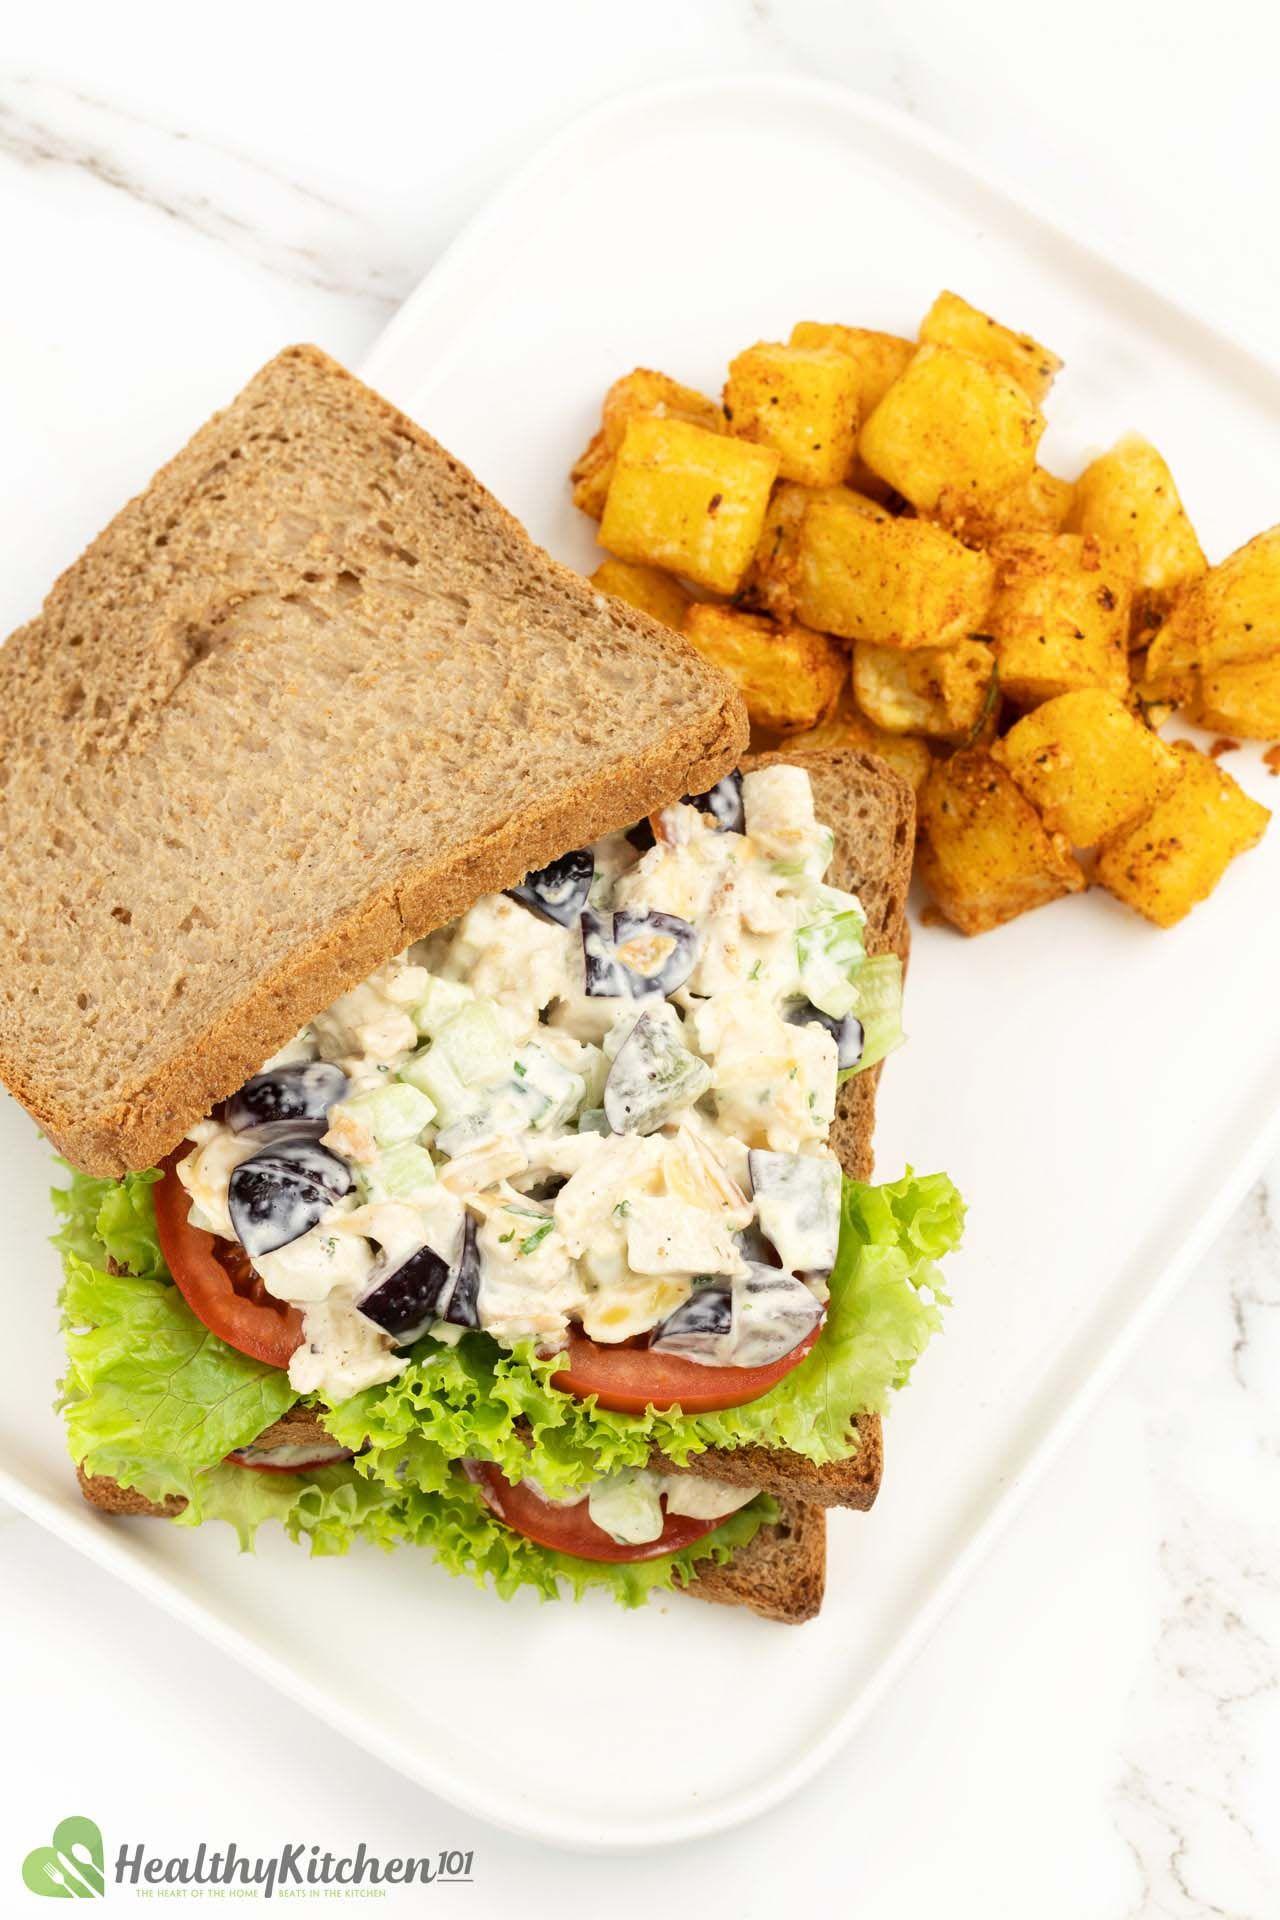 What to serve with chicken salad sandwich